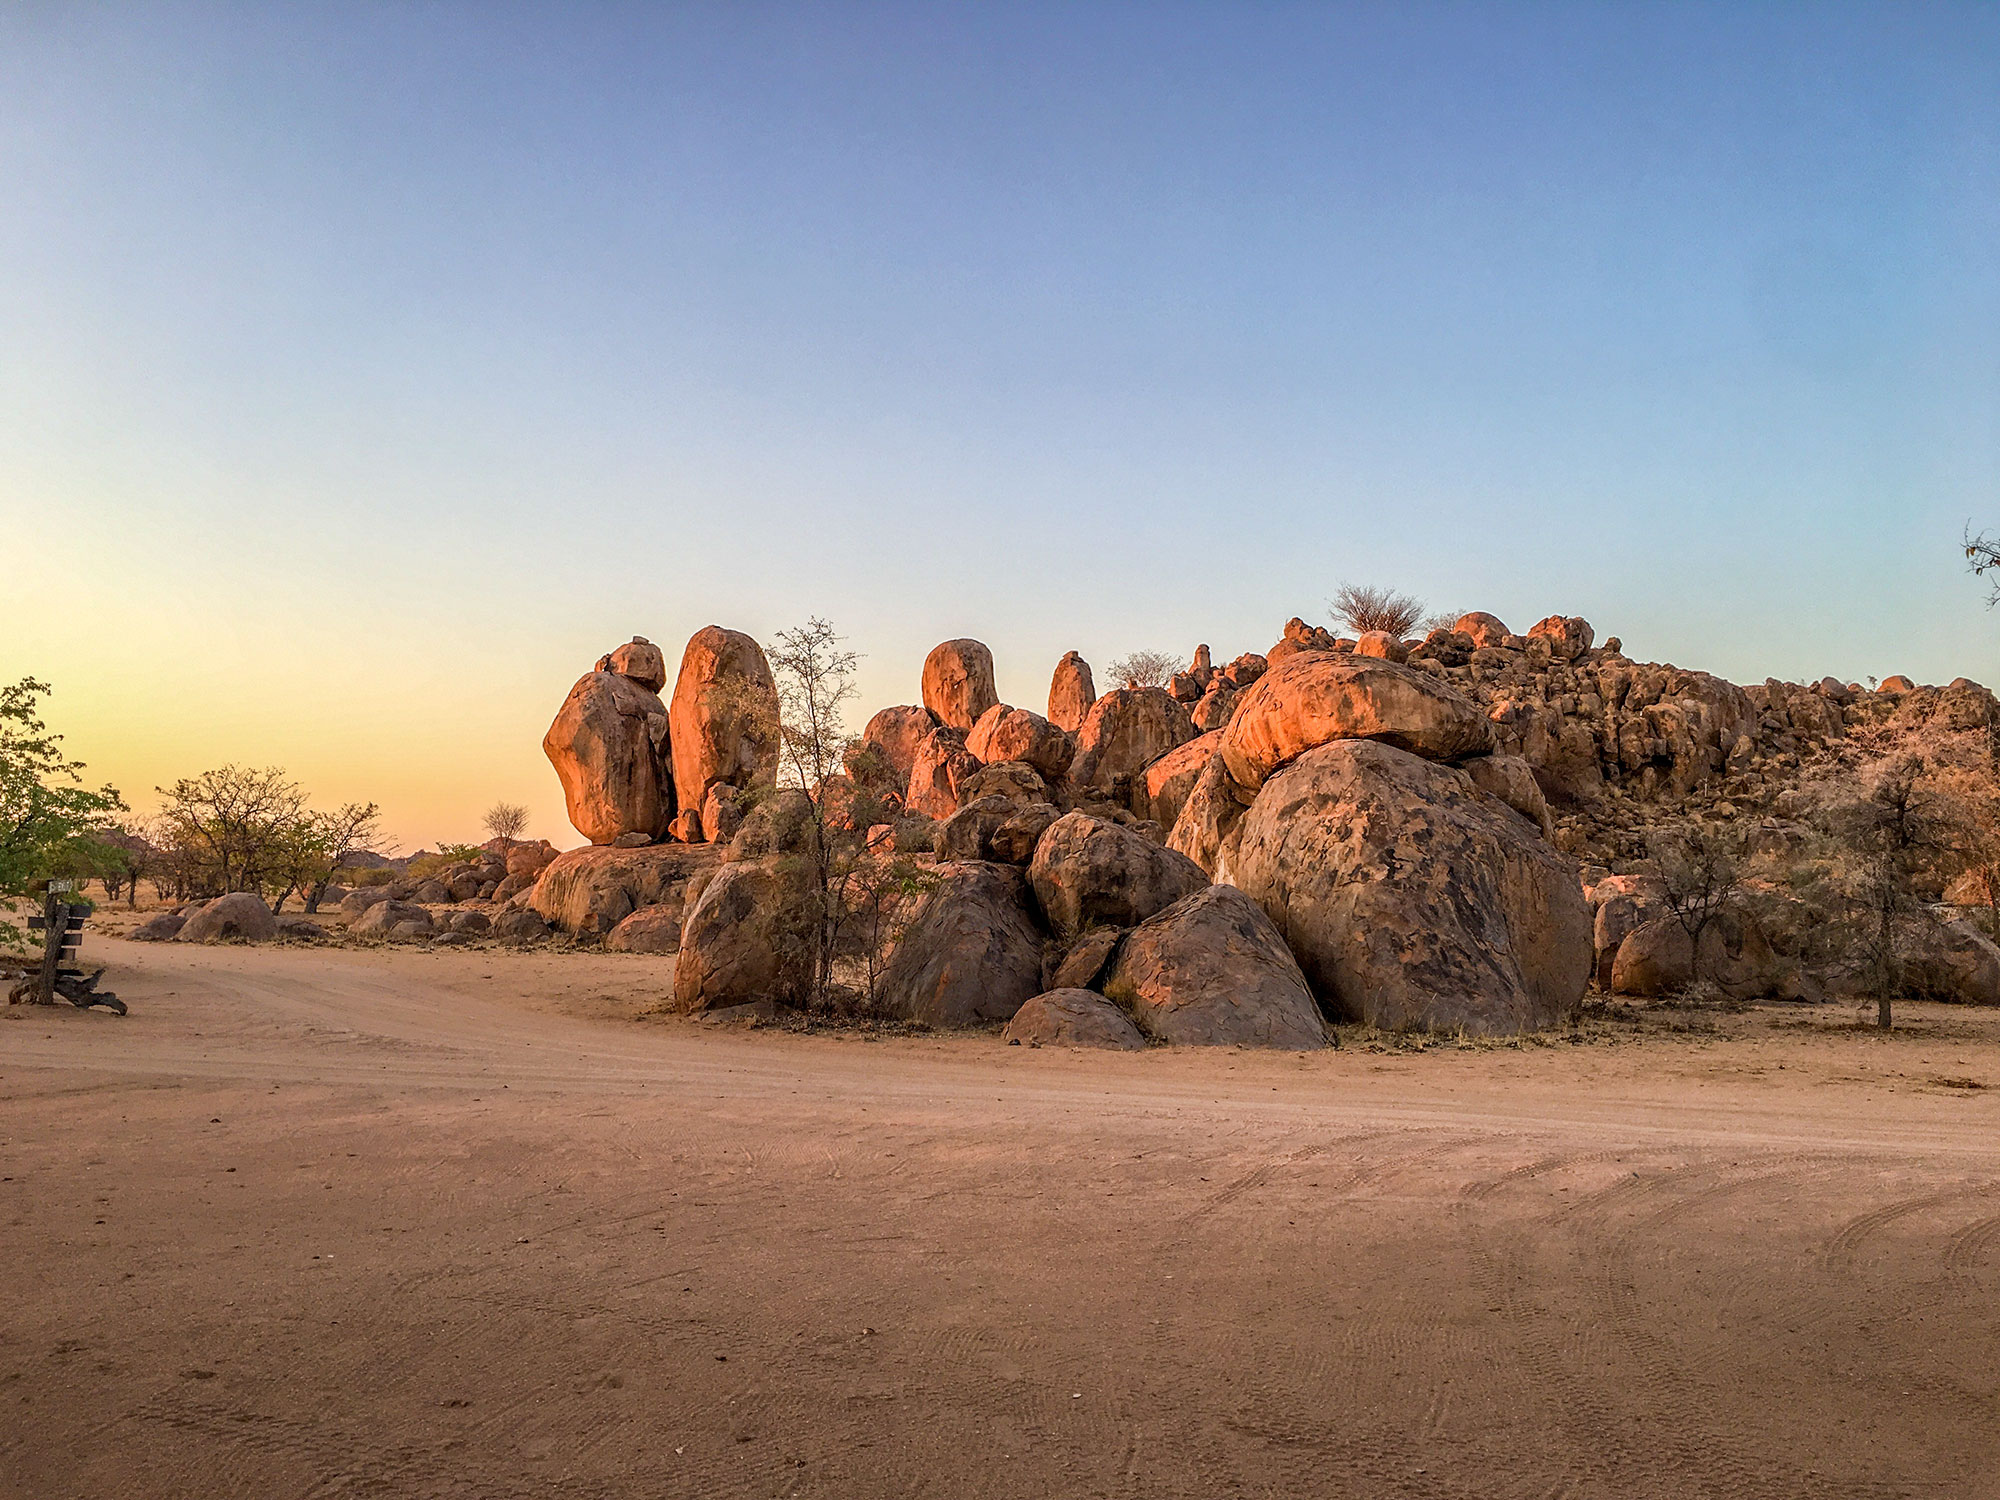 Damaraland rocks and desert in Namibia, Africa